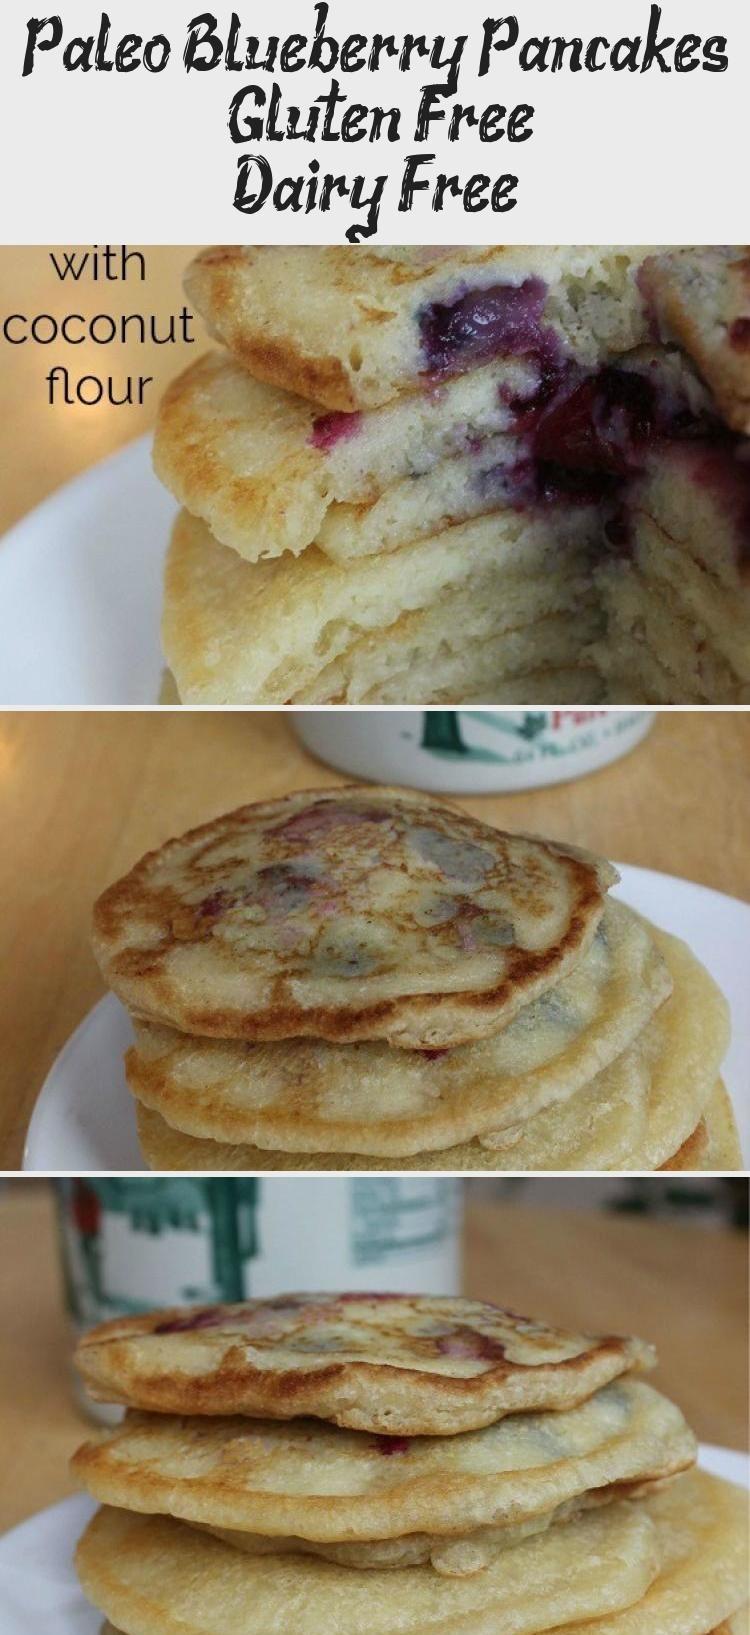 Paleo Blueberry Pancakes Gluten Free Dairy Free